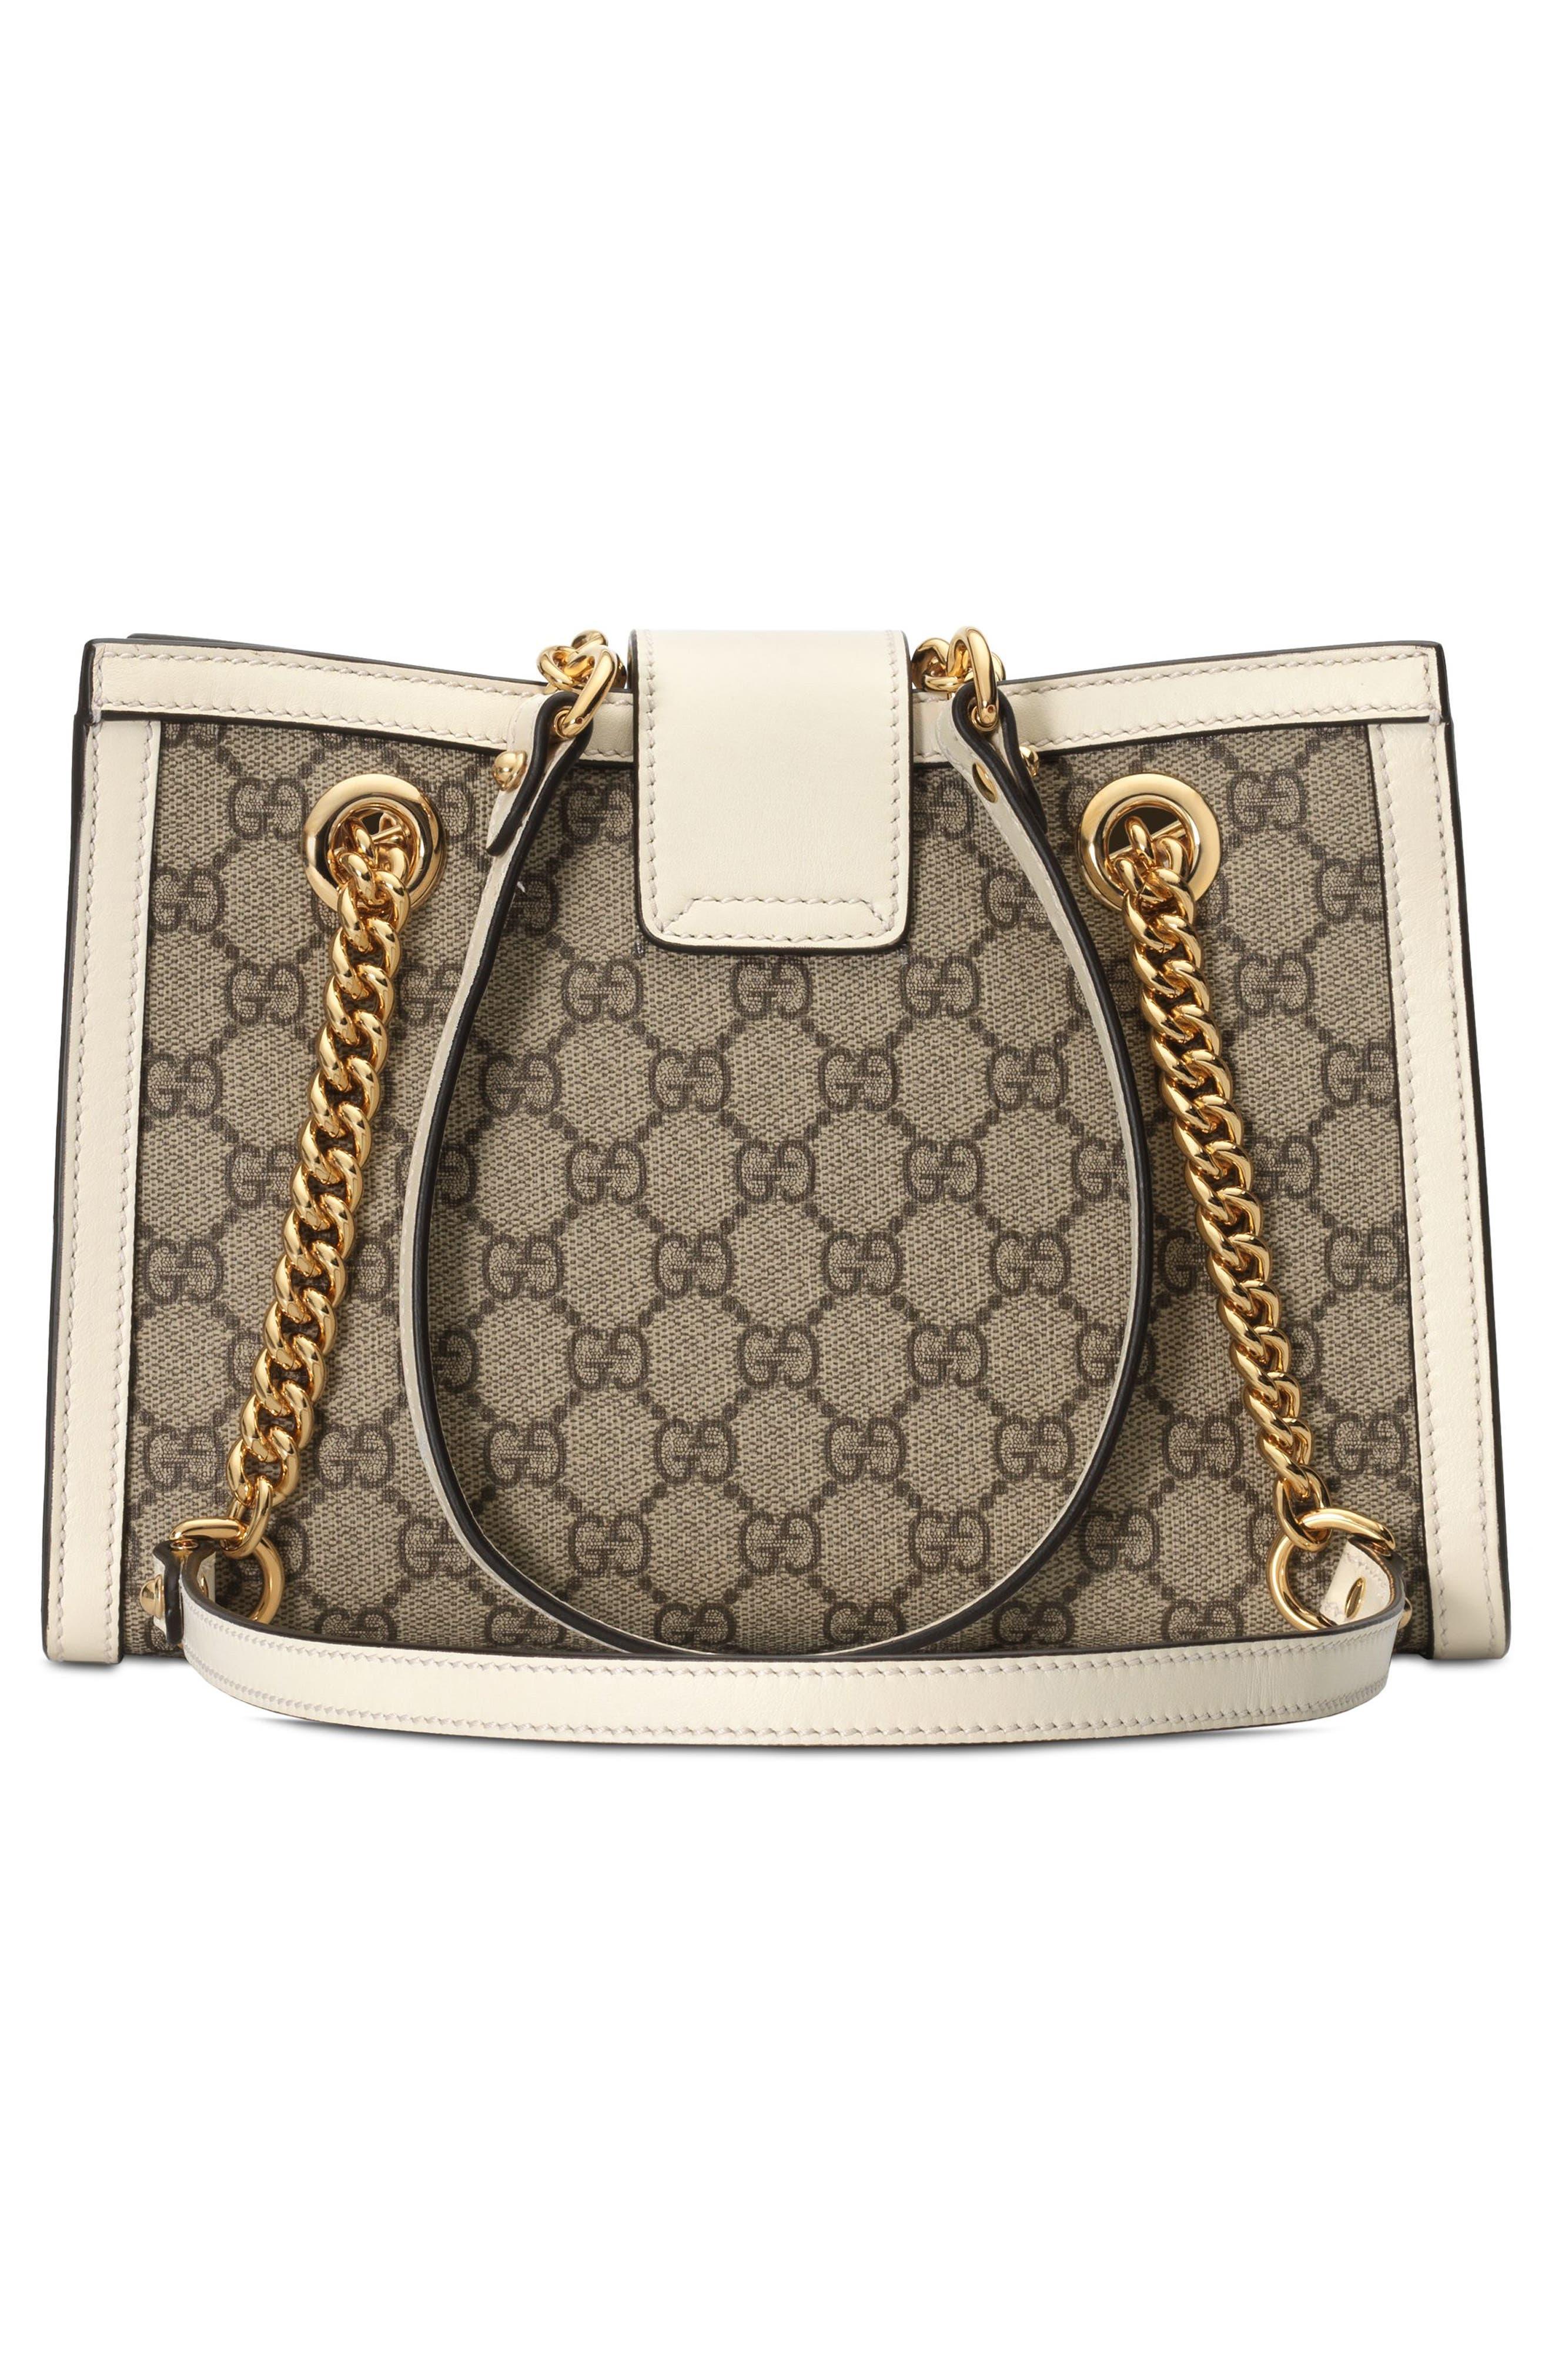 Small Padlock GG Supreme Shoulder Bag,                             Alternate thumbnail 2, color,                             BEIGE EBONY/ MYSTIC WHITE